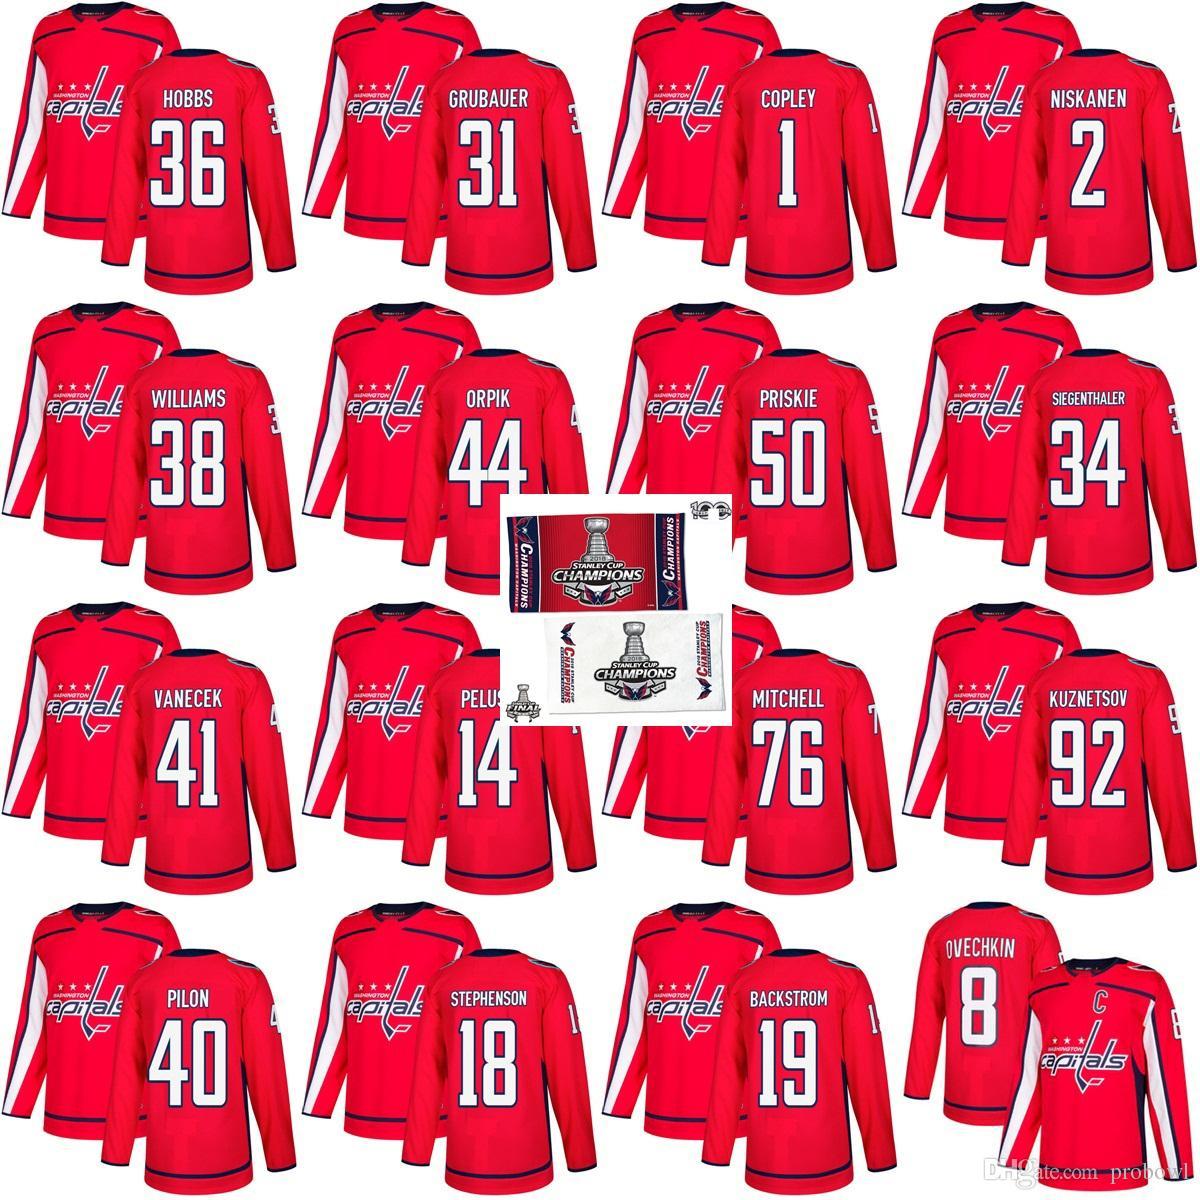 2383bb6e6 2019 2018 Stanley Cup Final Champion Washington Capitals Hockey Jersey 19  Nicklas Backstrom 8 Alex Ovechkin Pheonix Copley Grubauer Brooks Orpik From  ...